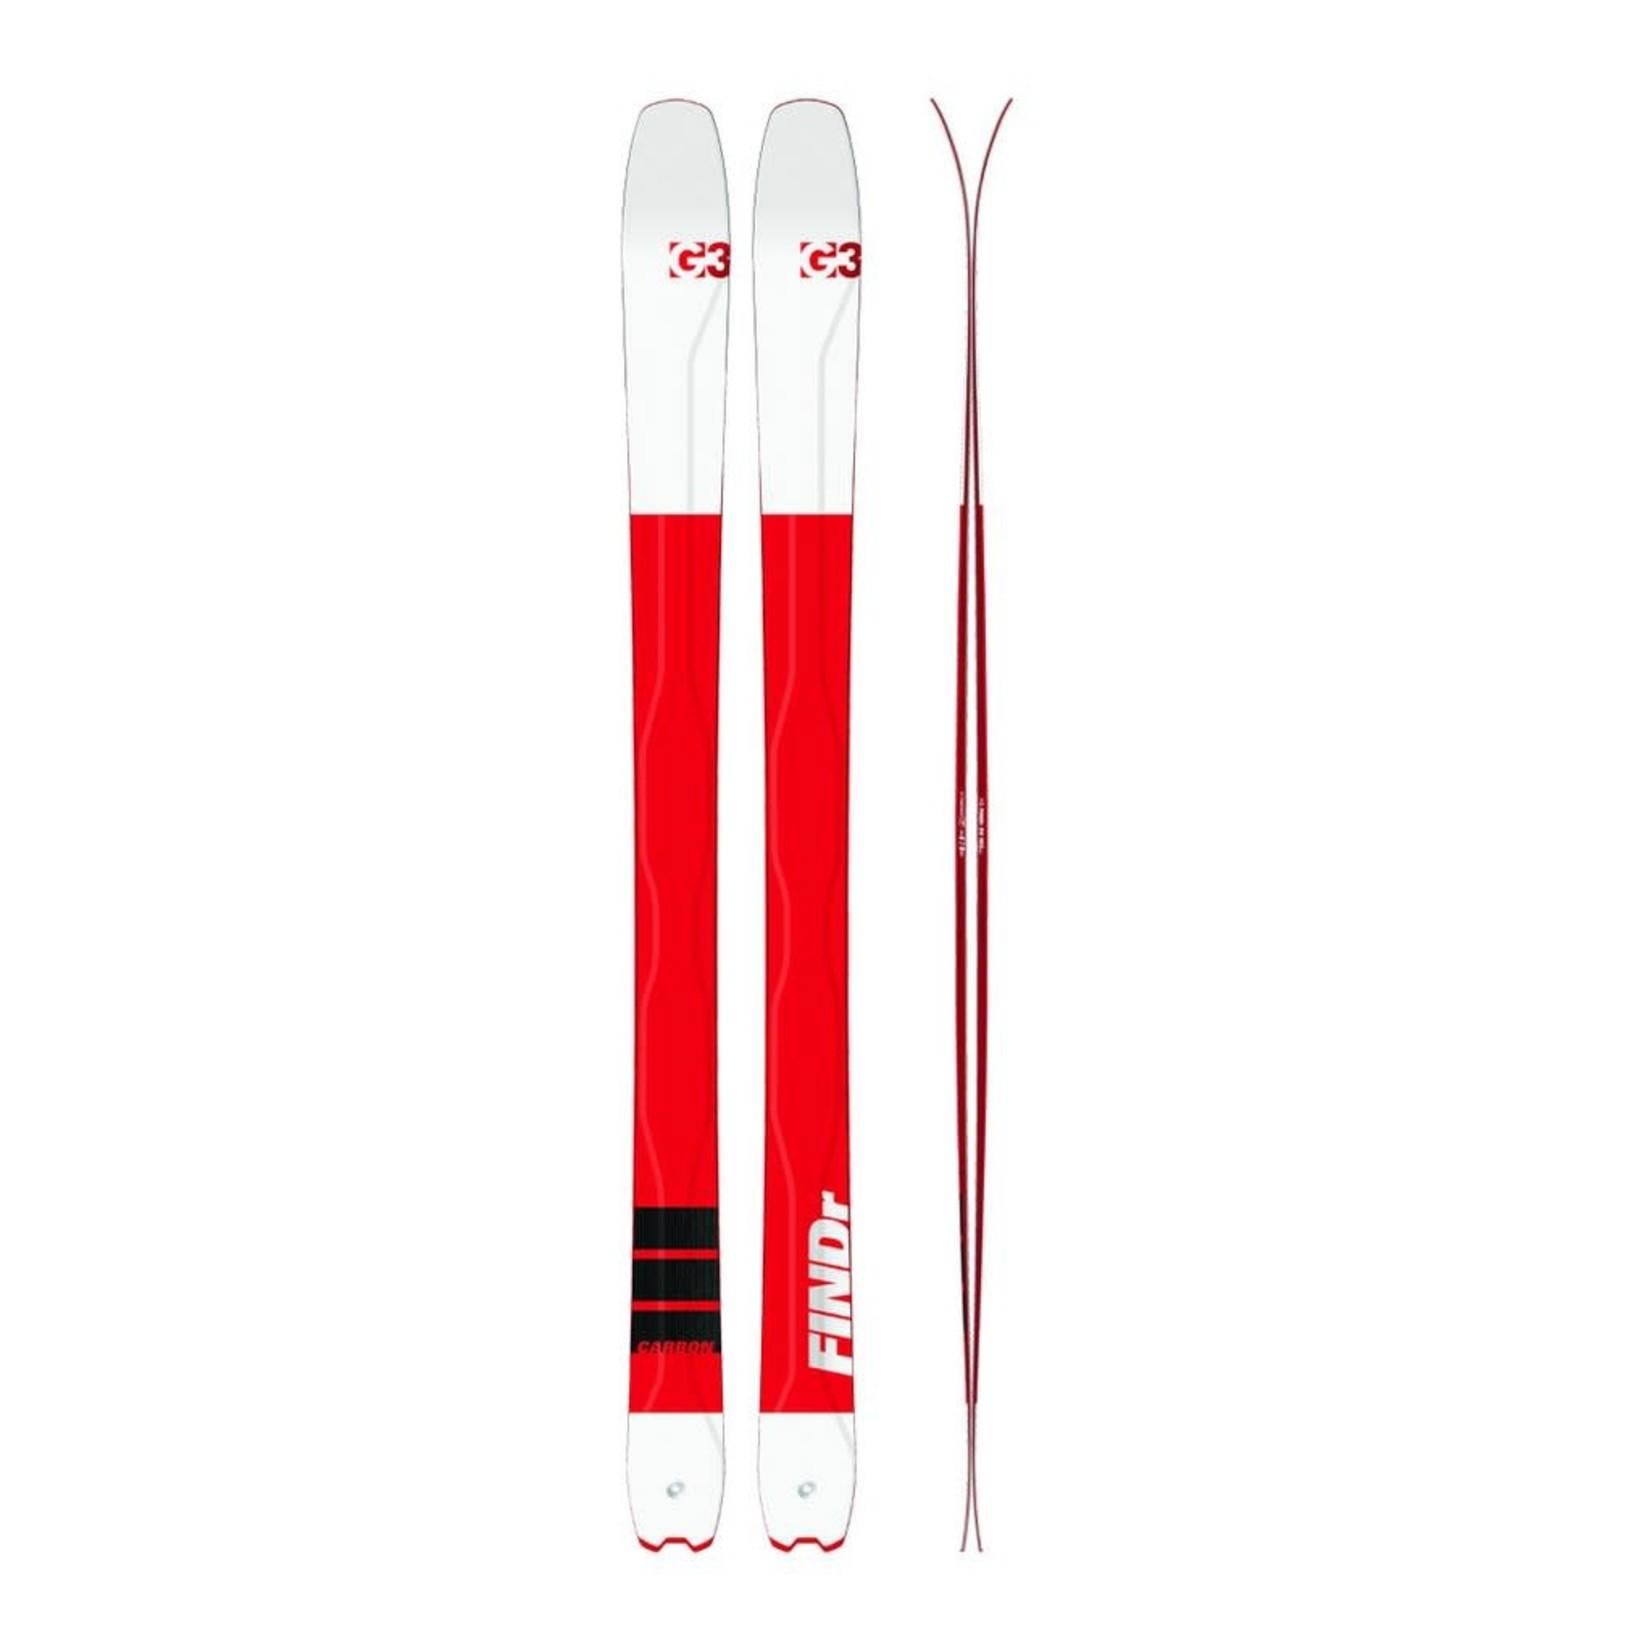 G3 G3 FINDr 102 Skis